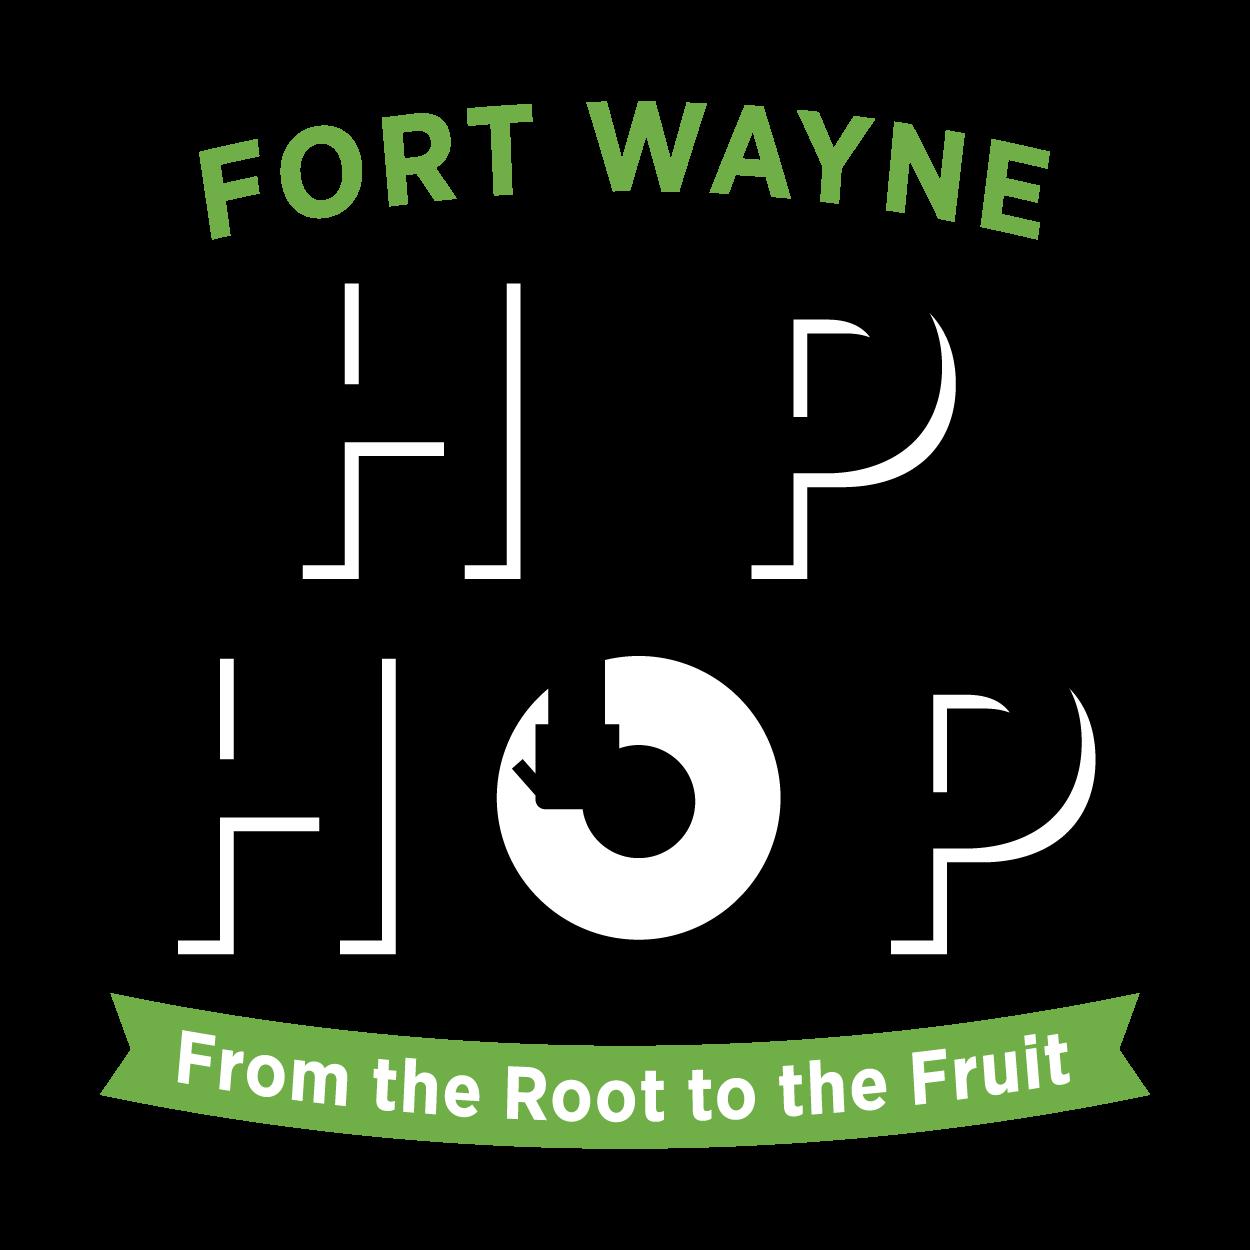 FWHH-logo-green-black.png